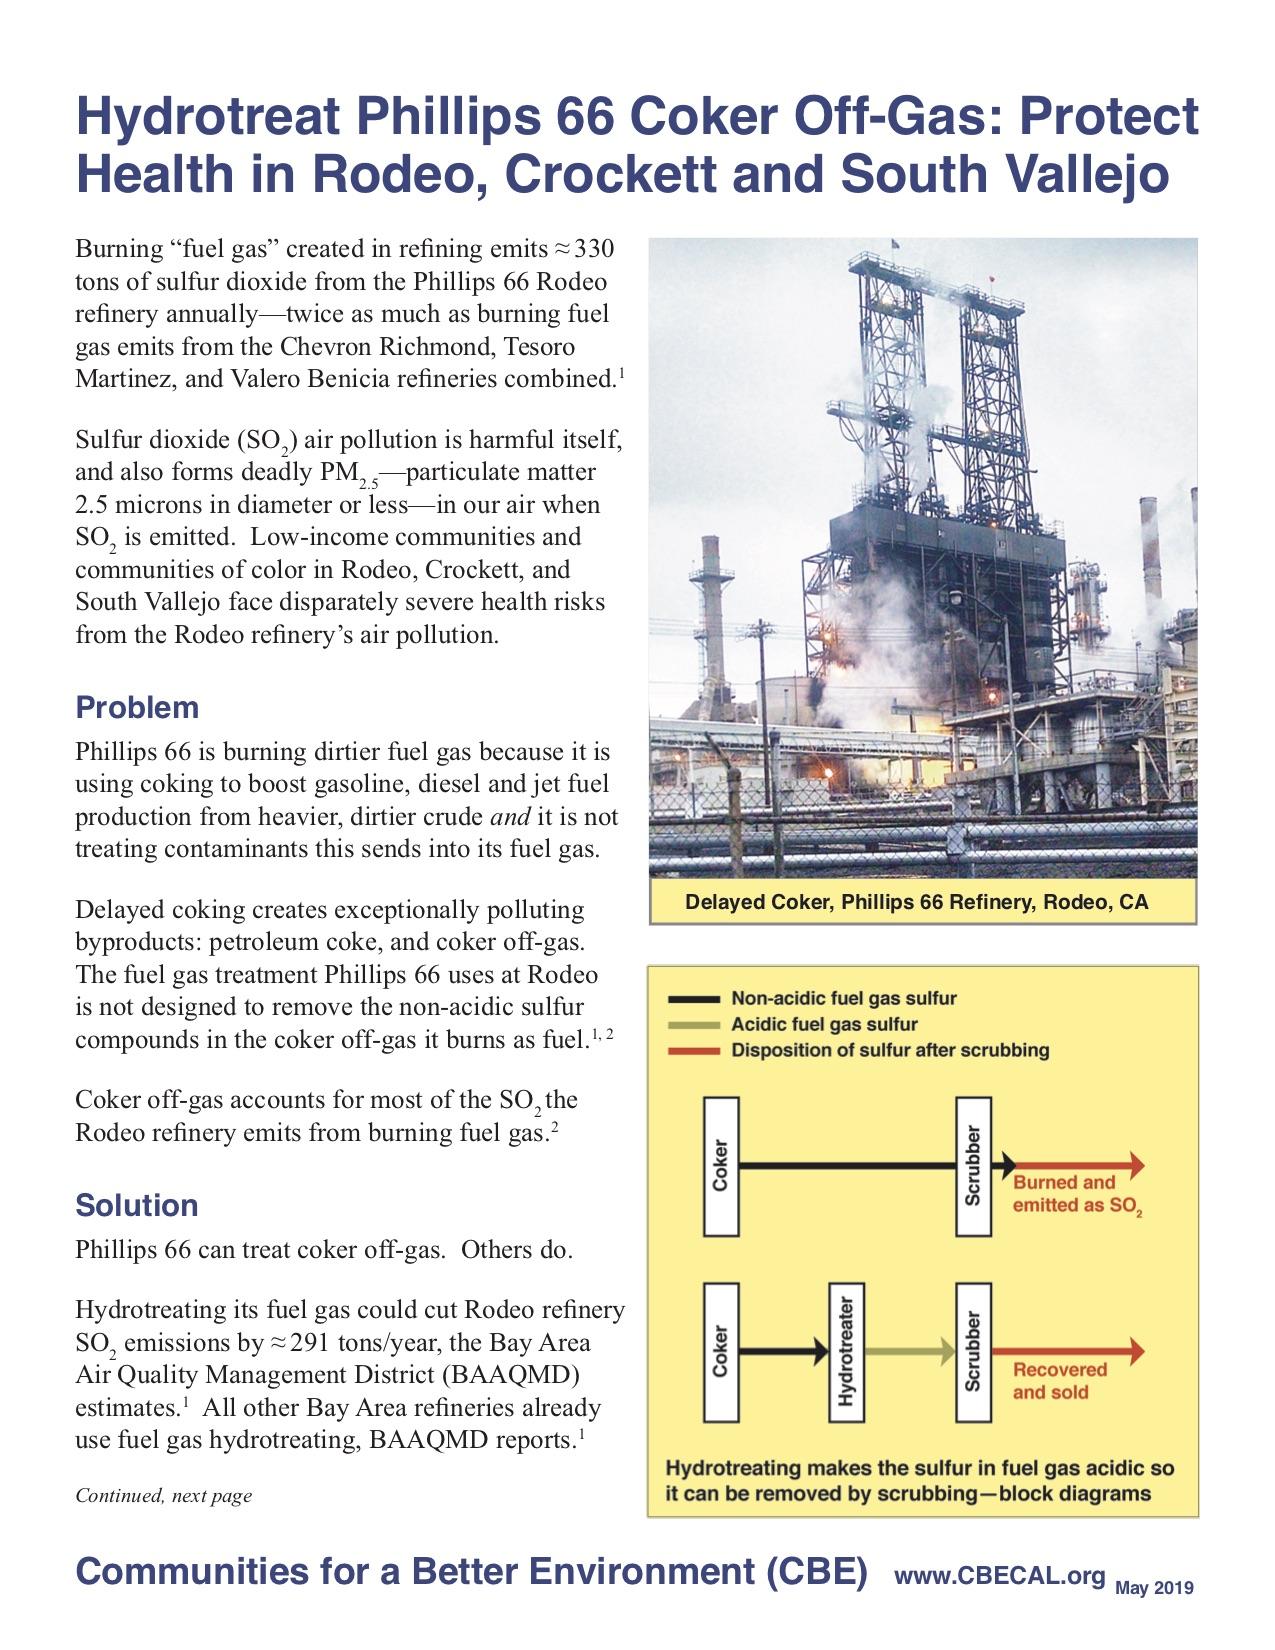 Refinery Fuel Gas Rule Factsheet 1.jpg